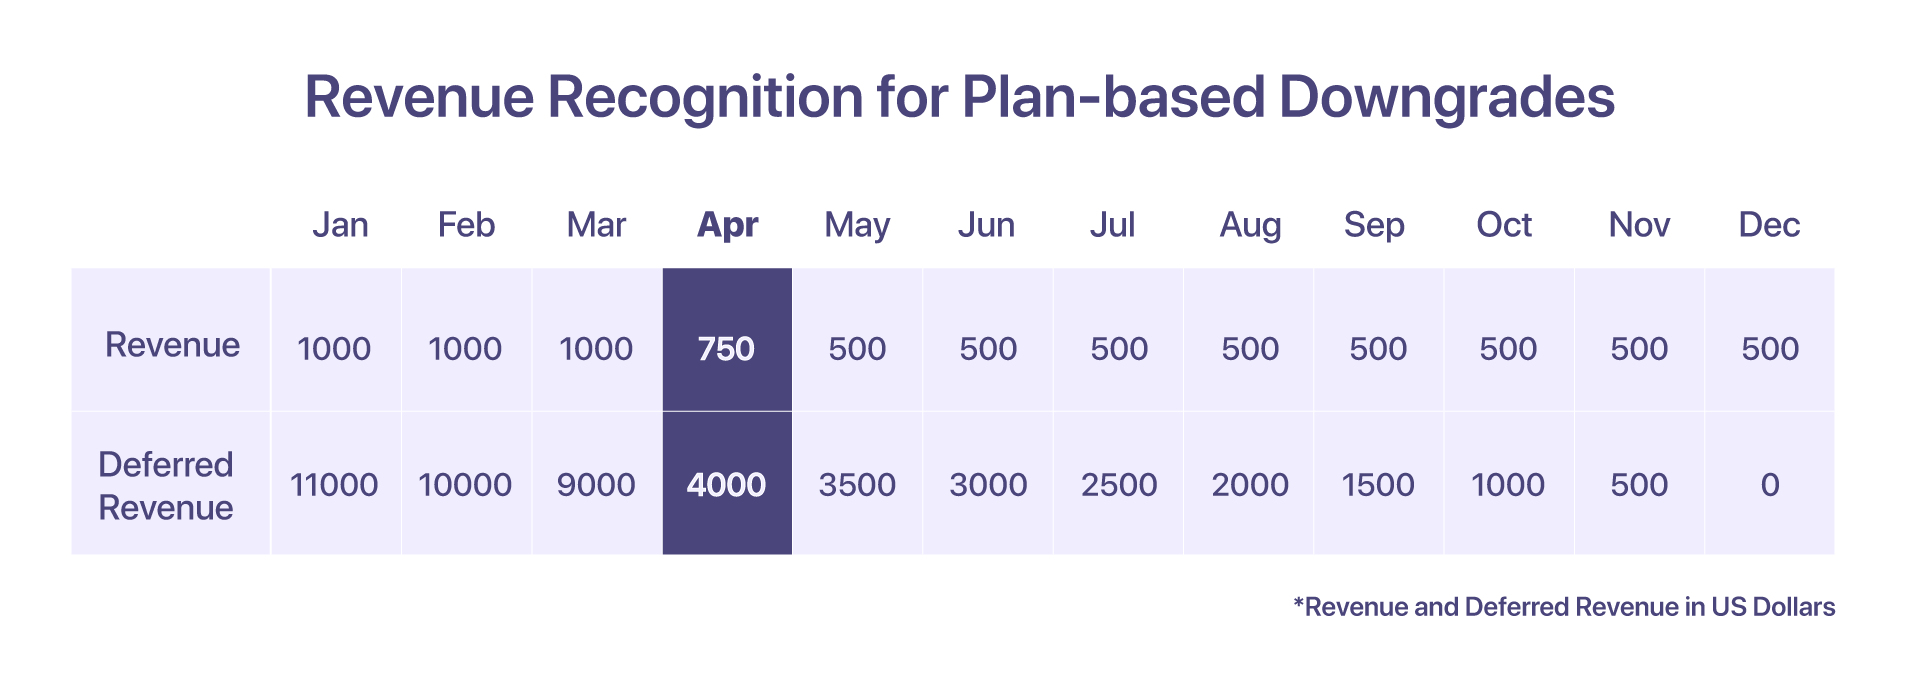 revenue recognition for plan-based downgrades